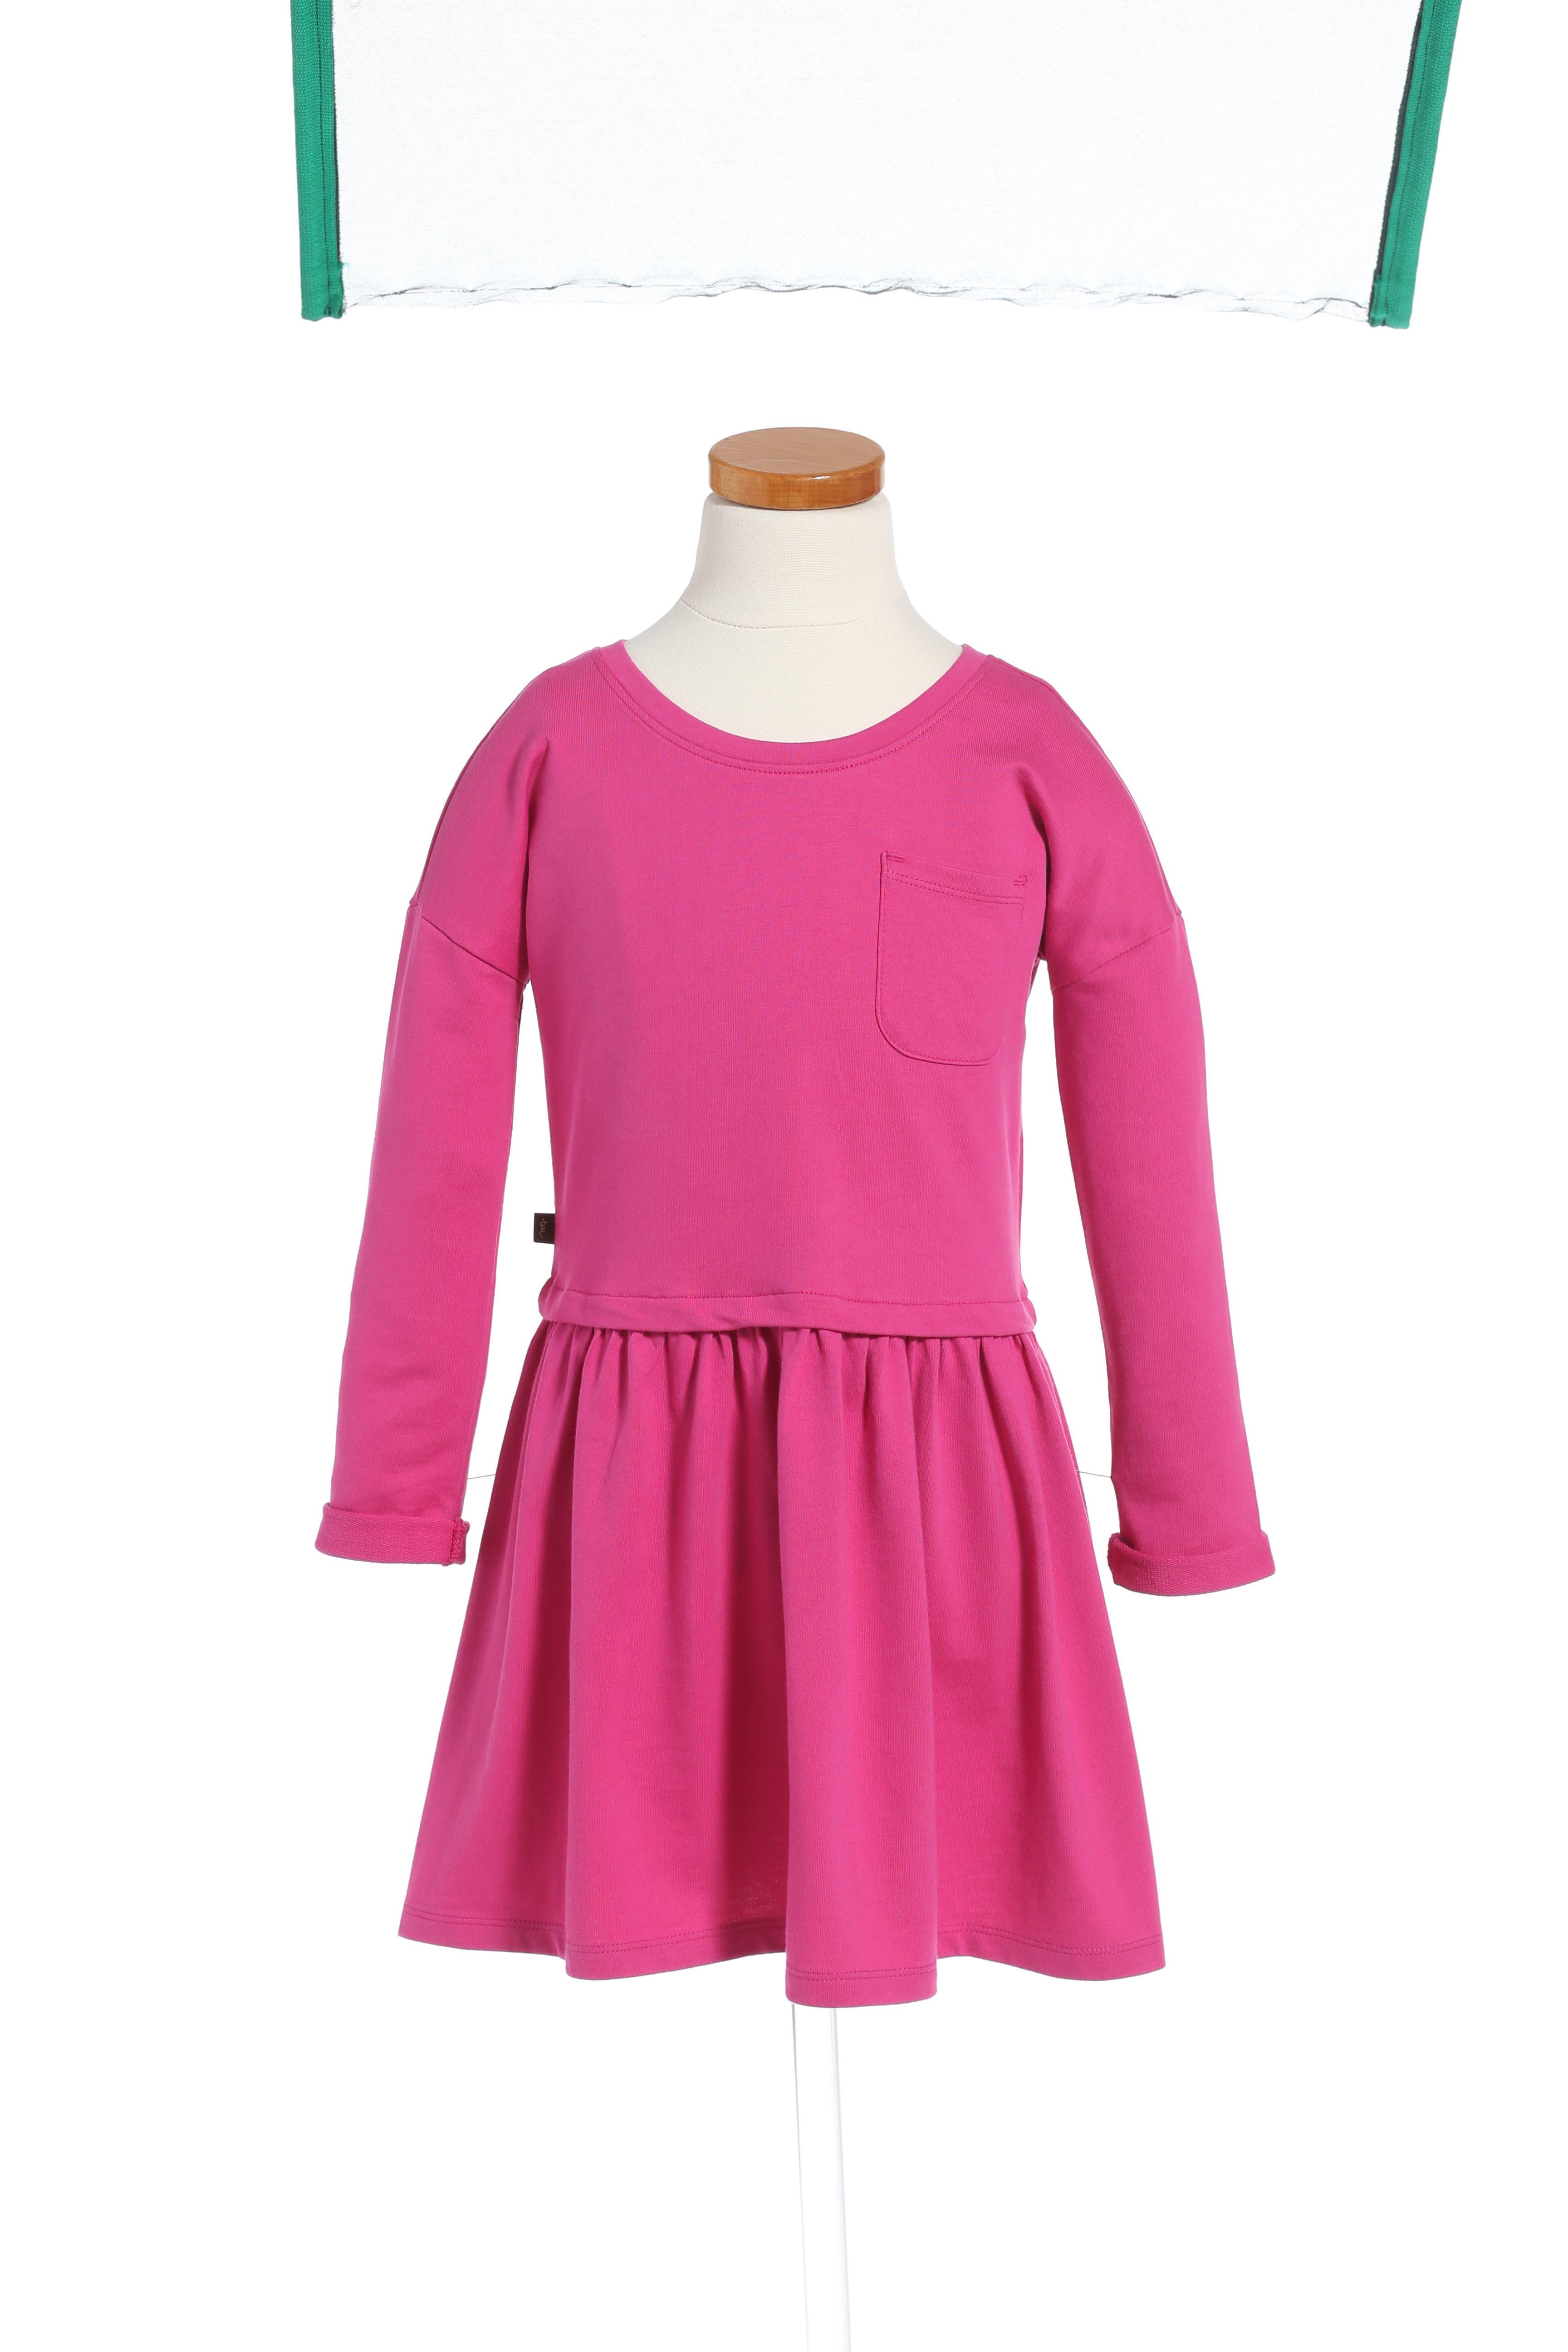 Tea Collection Solid Pocket Dress (Toddler Girls, Little Girls & Big Girls)